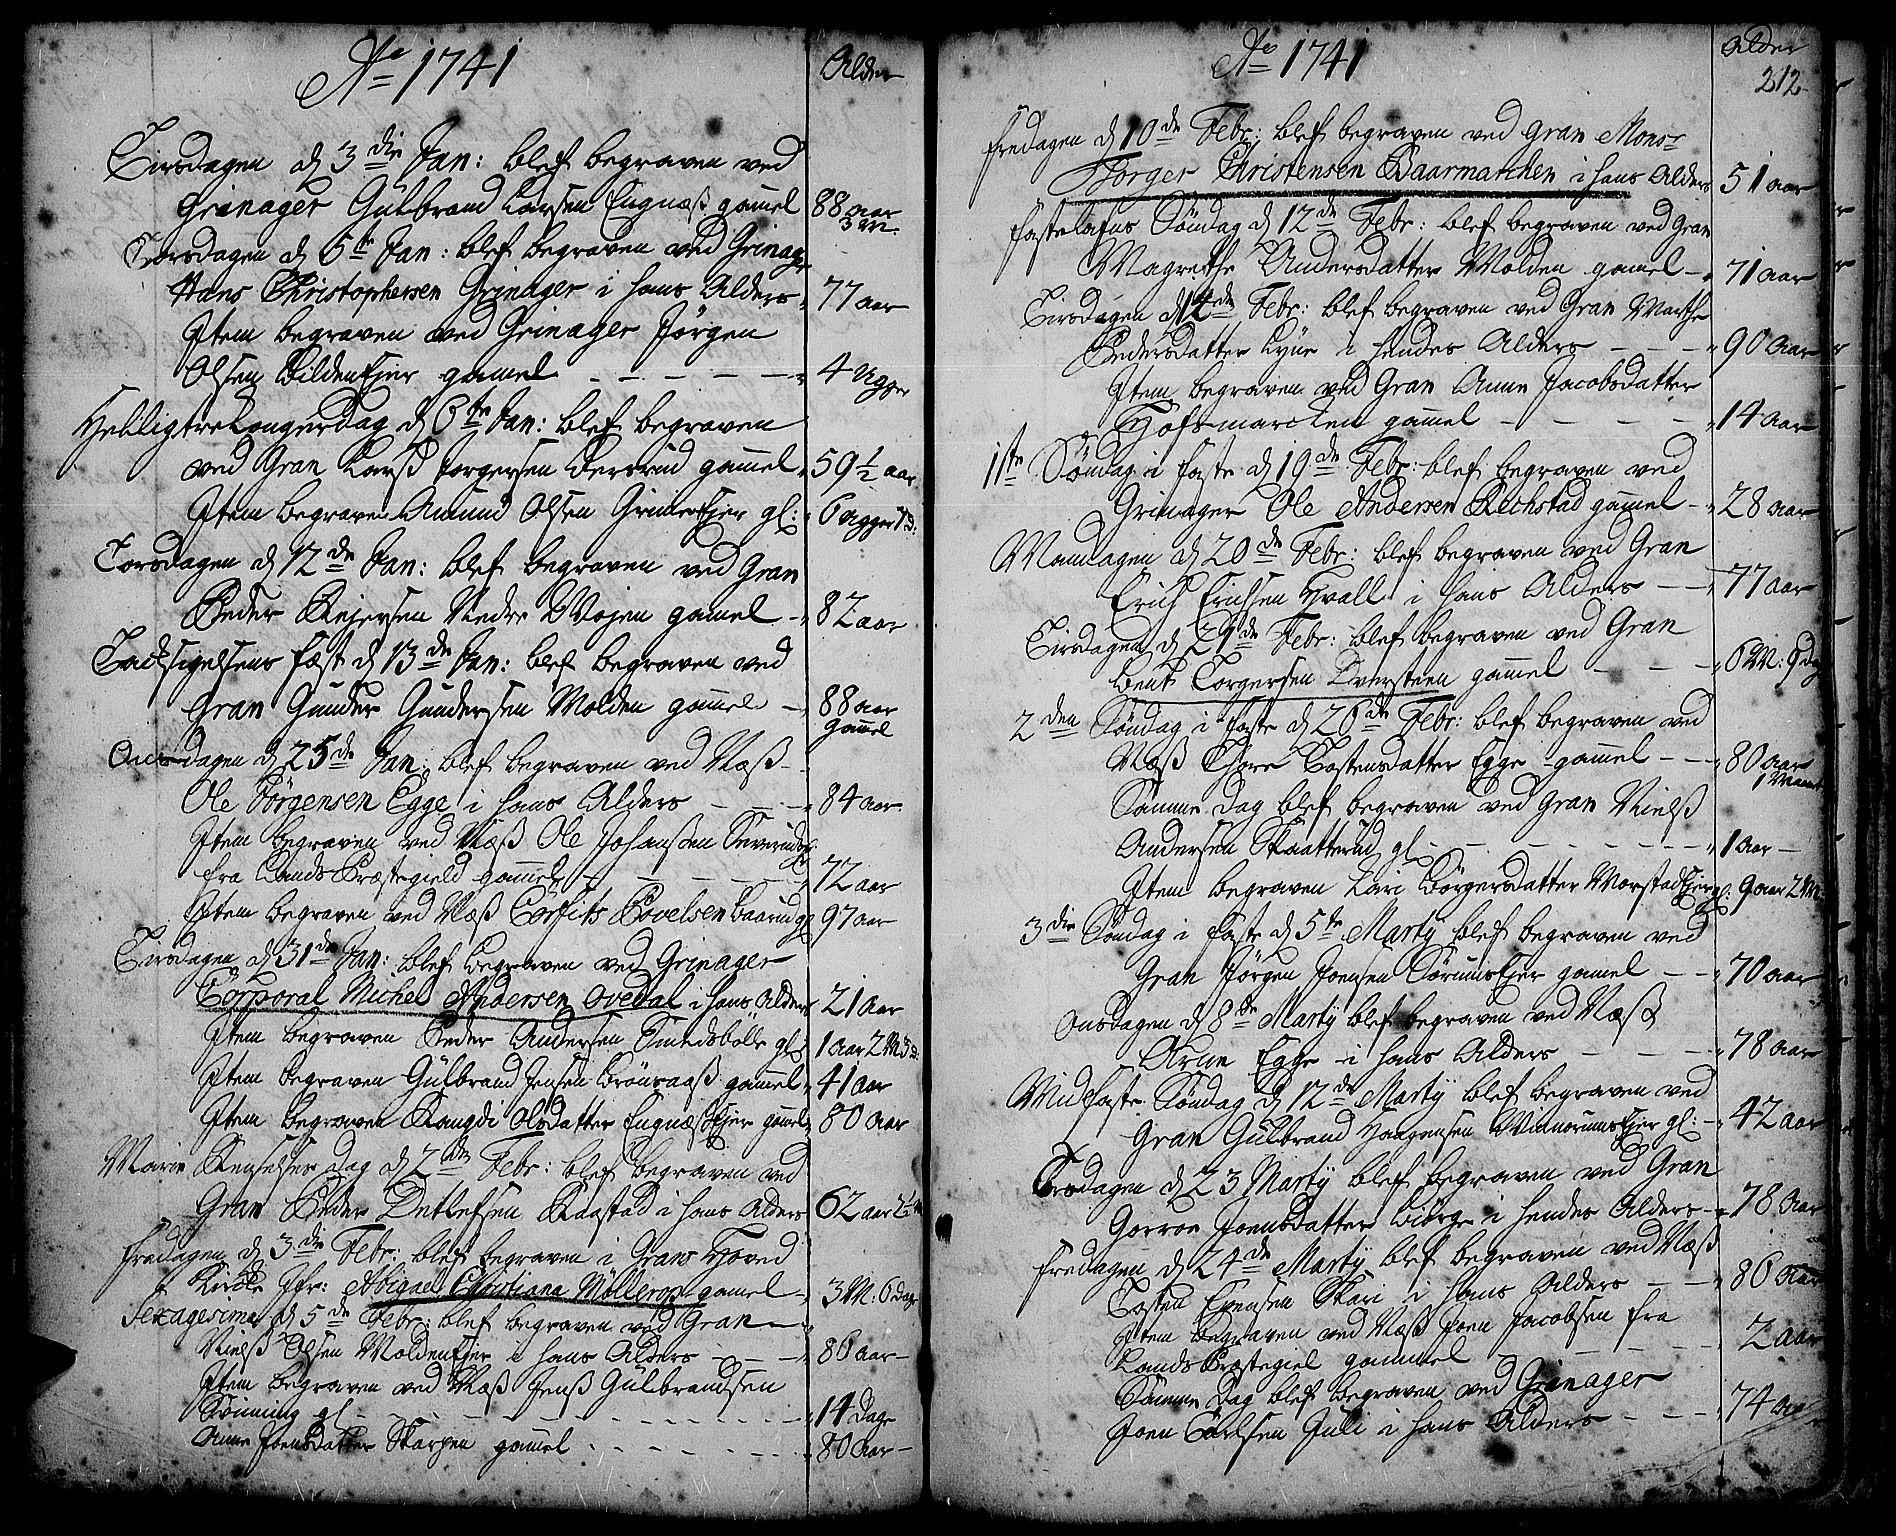 SAH, Gran prestekontor, Ministerialbok nr. 2, 1732-1744, s. 212